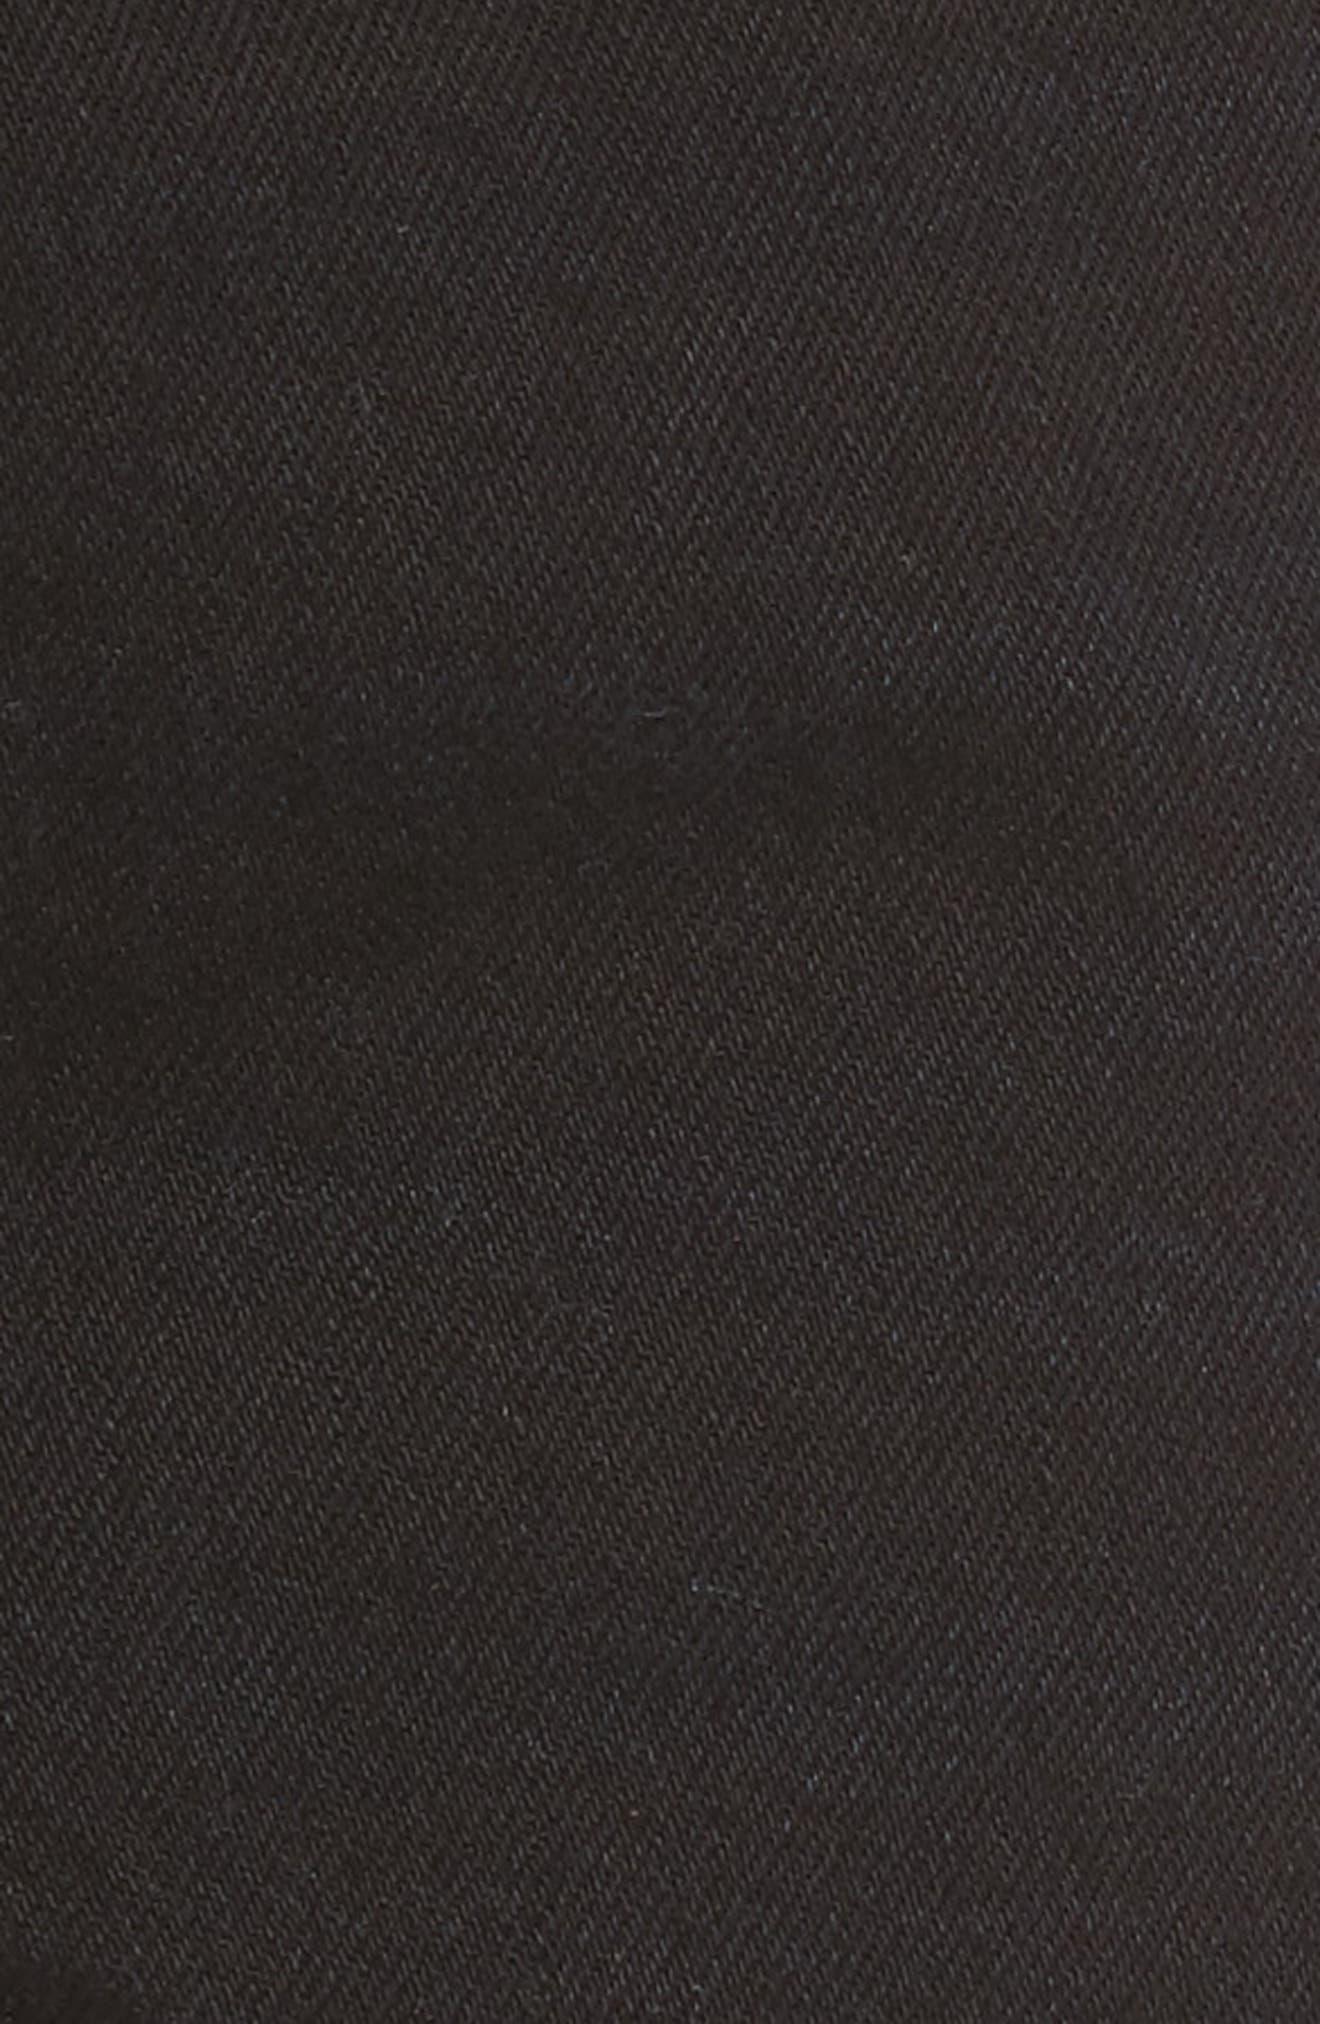 LEVI'S<SUP>®</SUP>, 501<sup>®</sup> High Rise Denim Shorts, Alternate thumbnail 6, color, DARKEST HOUR